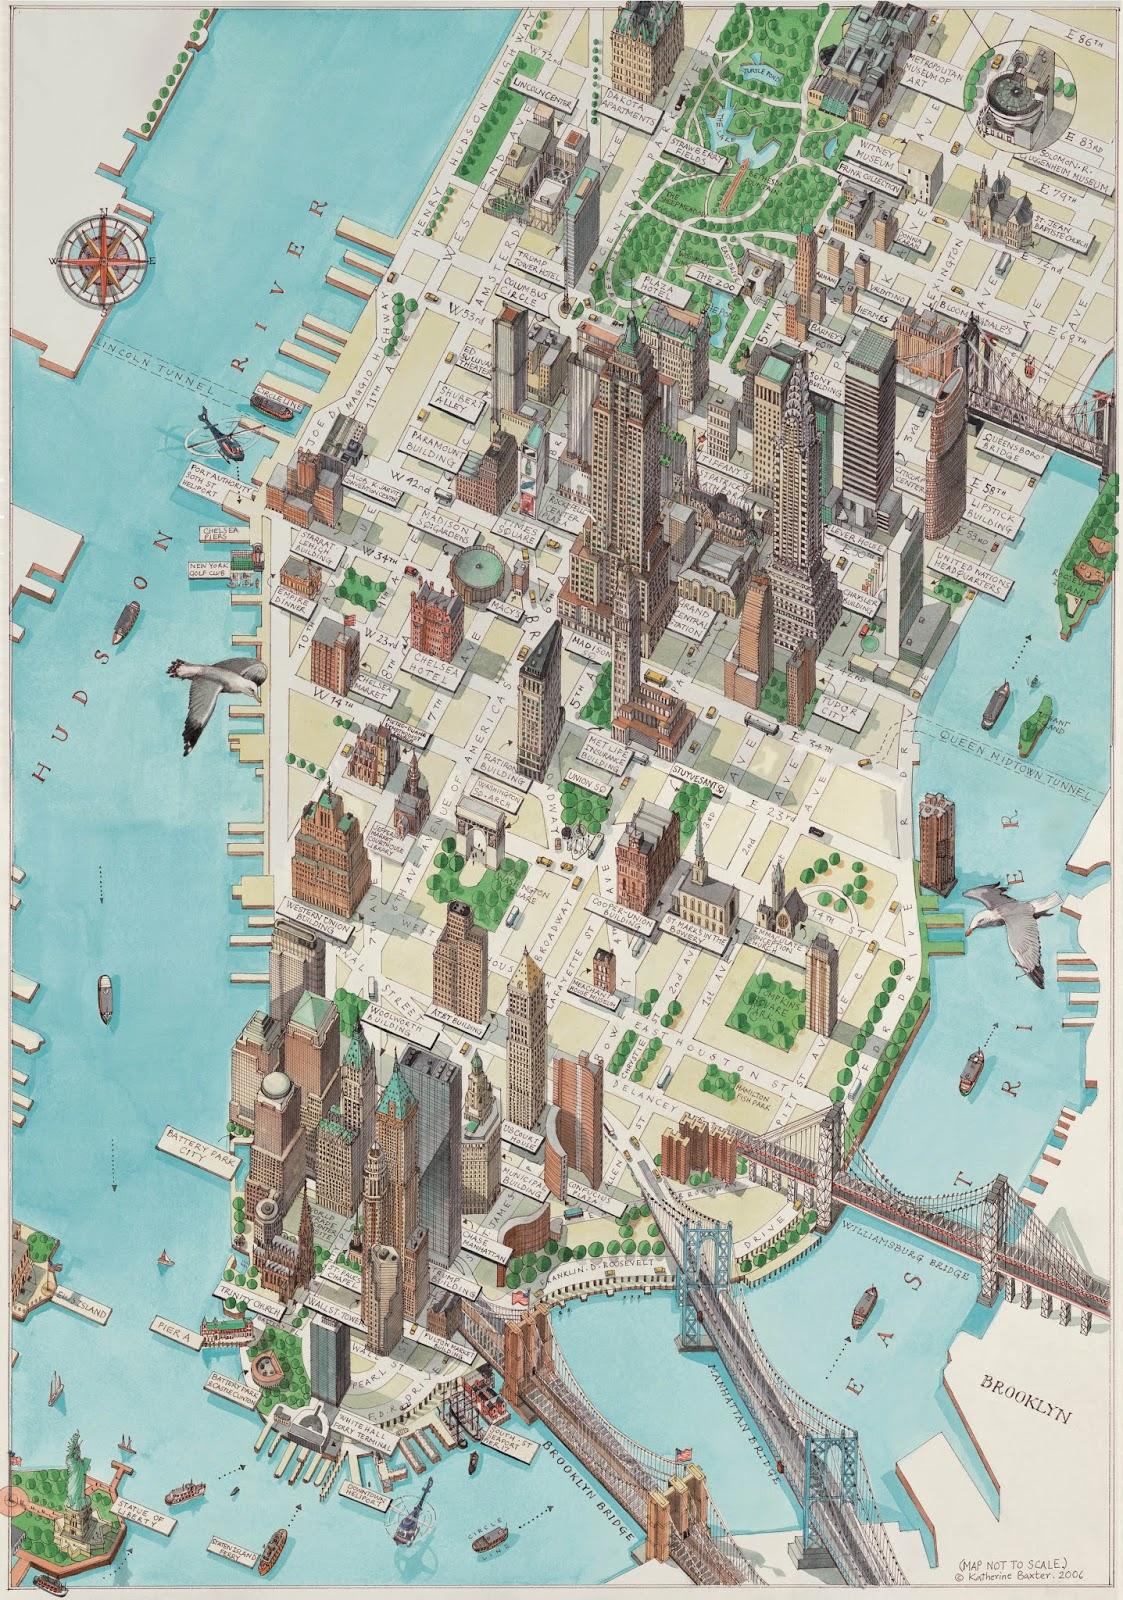 Tourist Map Of New York City Printable.New York Tourist Map Brooklyn Bridge With New York Tourist Map